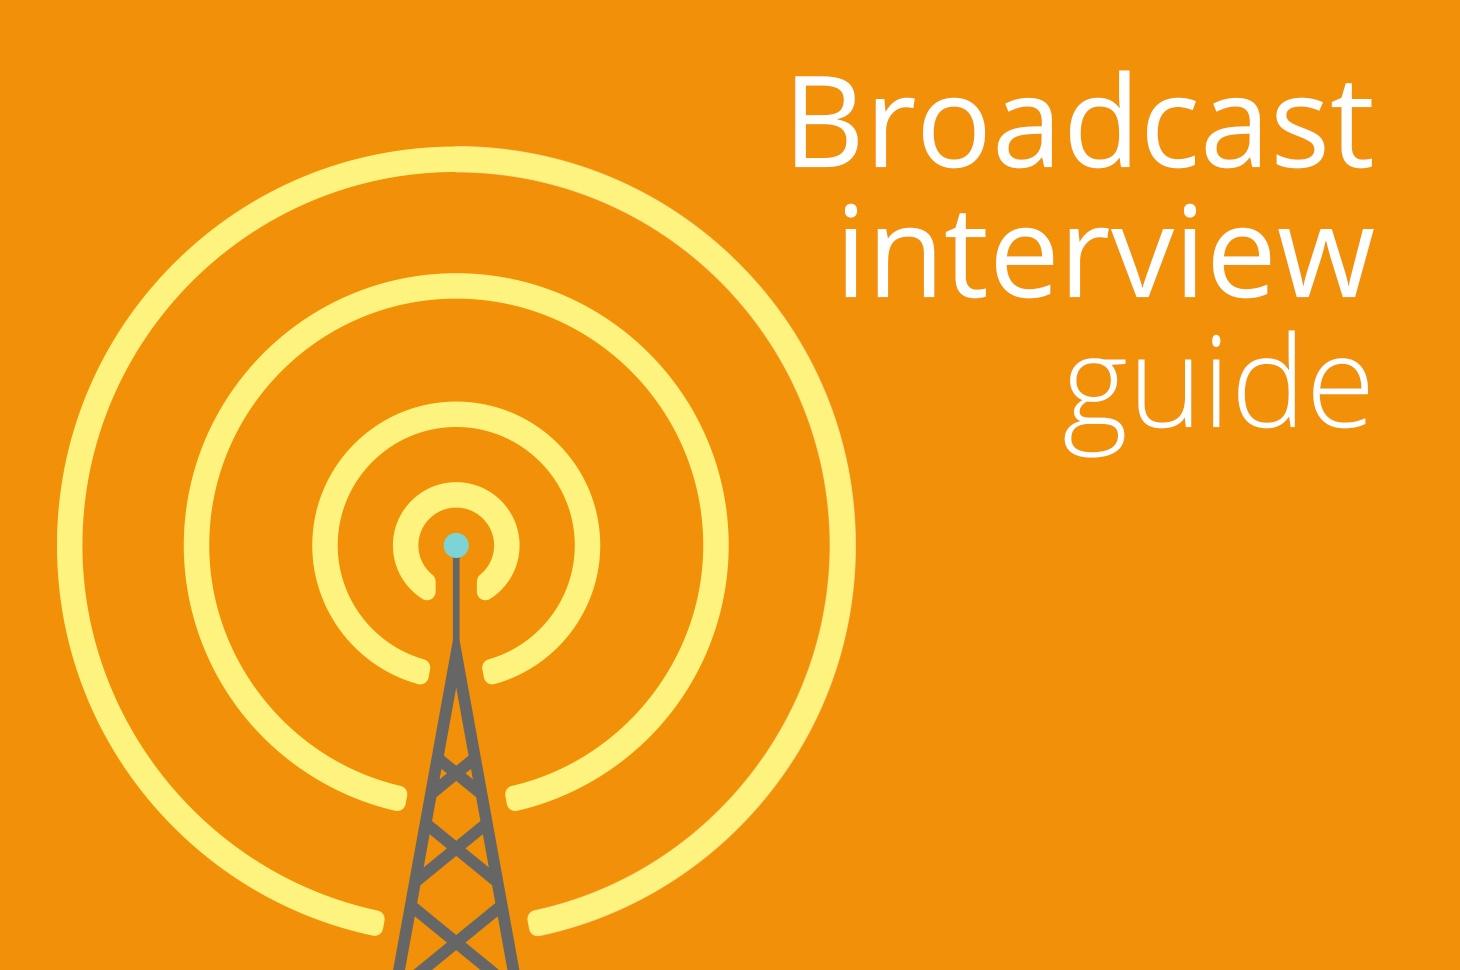 BroadcastInterview.jpg